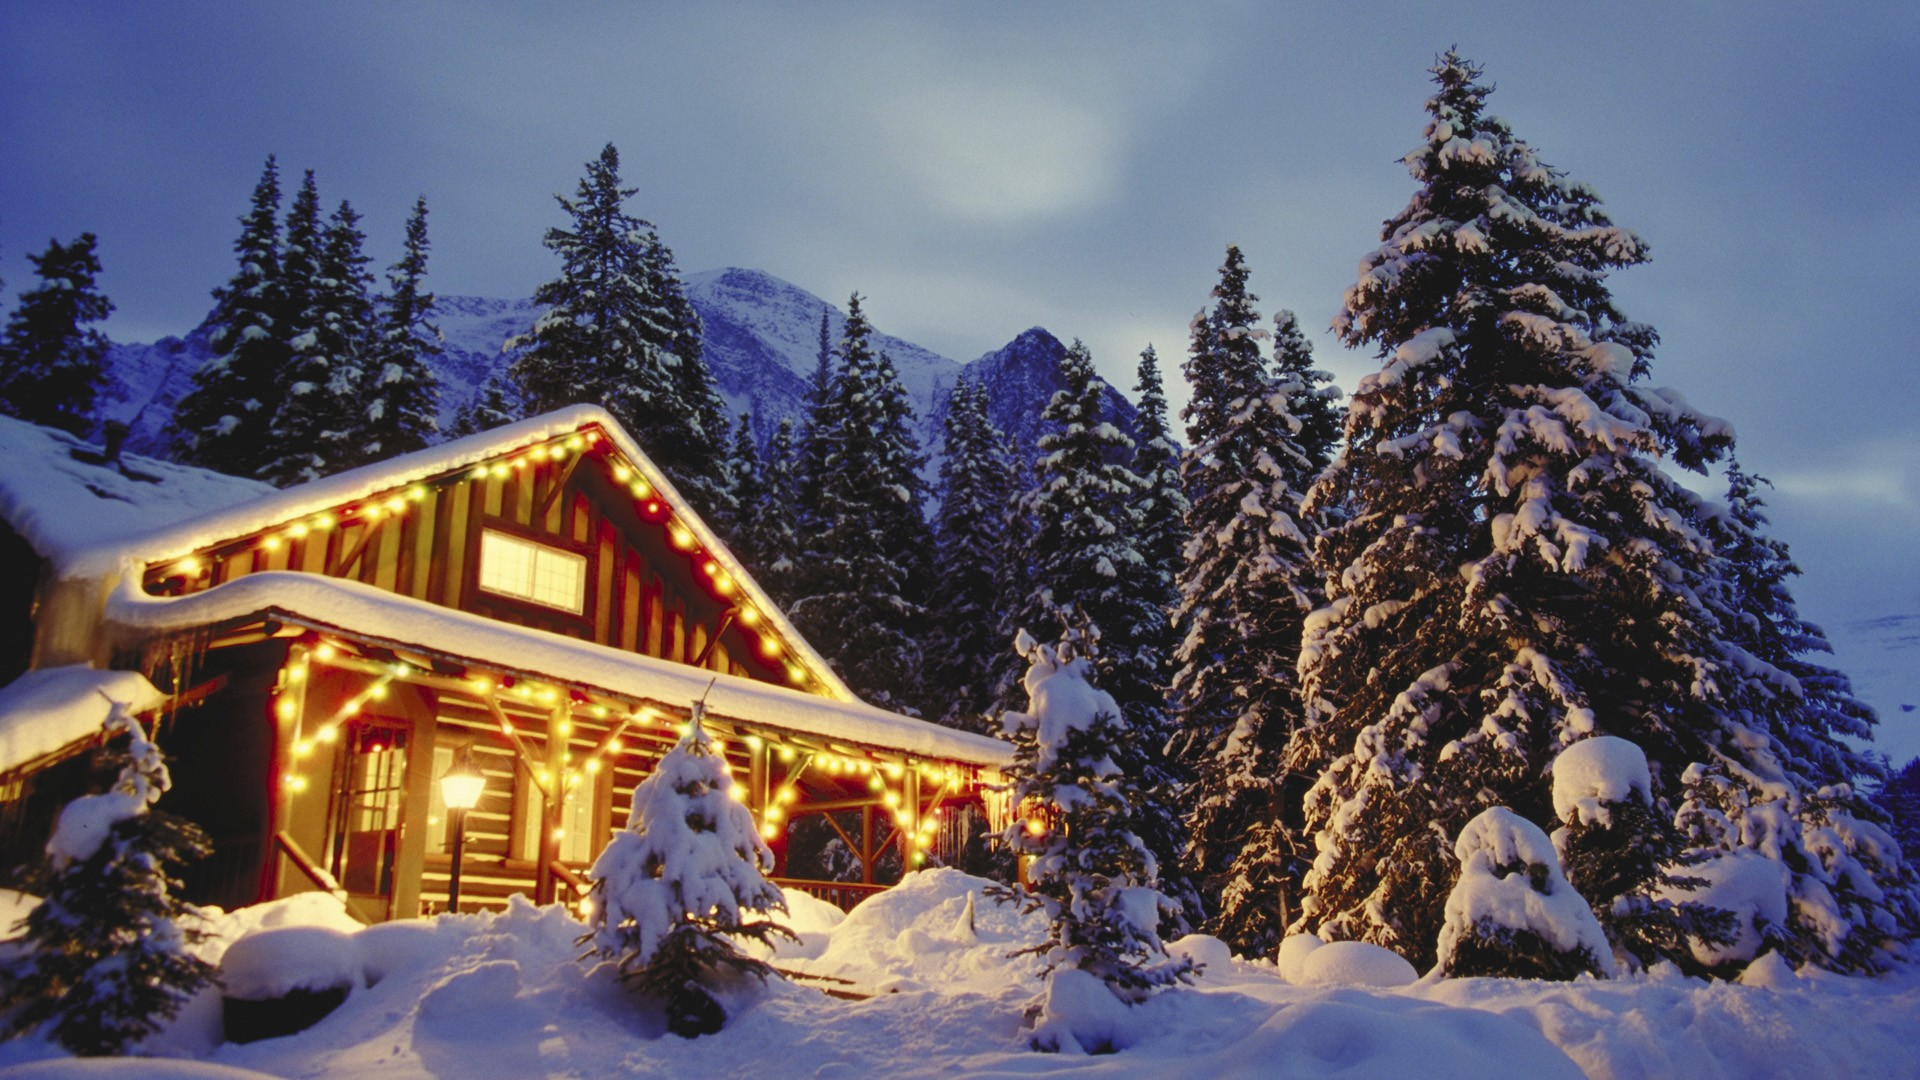 christmas wallpaper mountains snowy scene 1920x1080 1920x1080